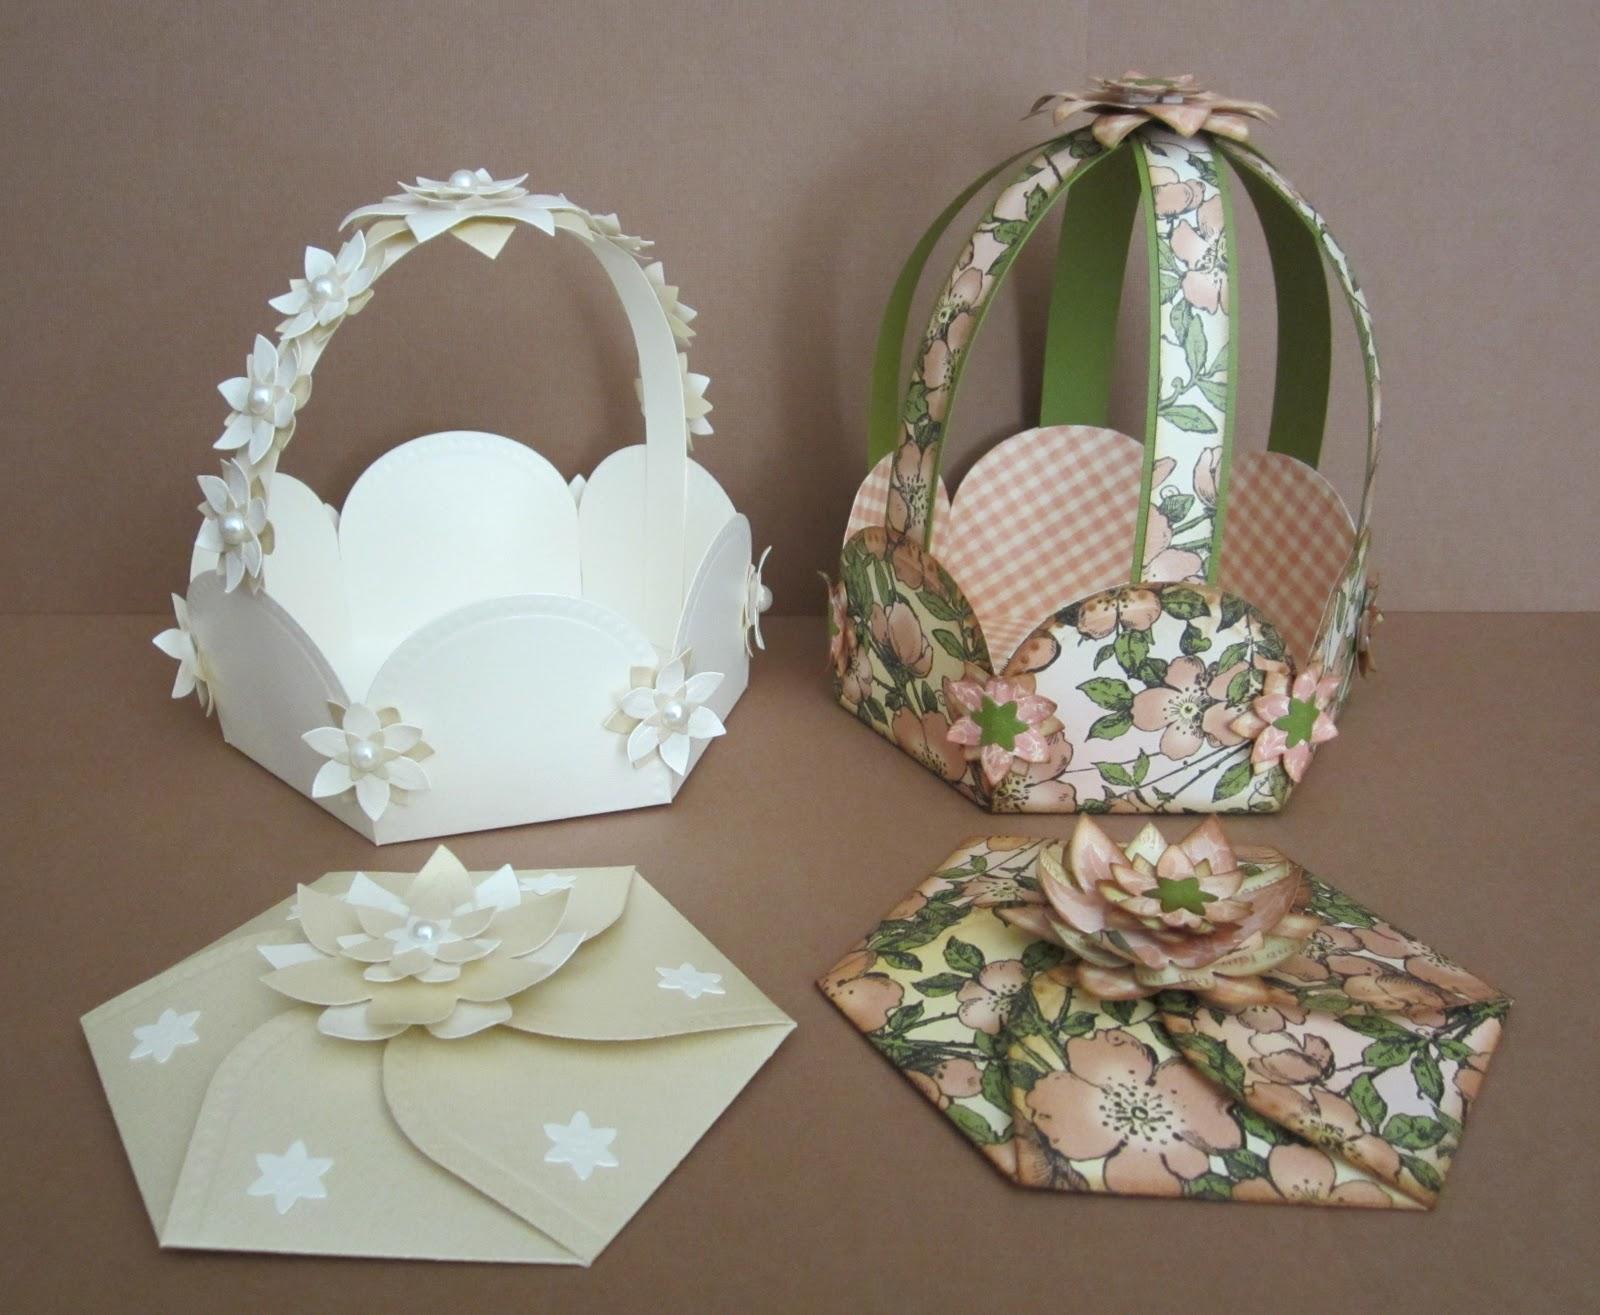 designs by marisa  hexagon petal envelope and basket ensemble